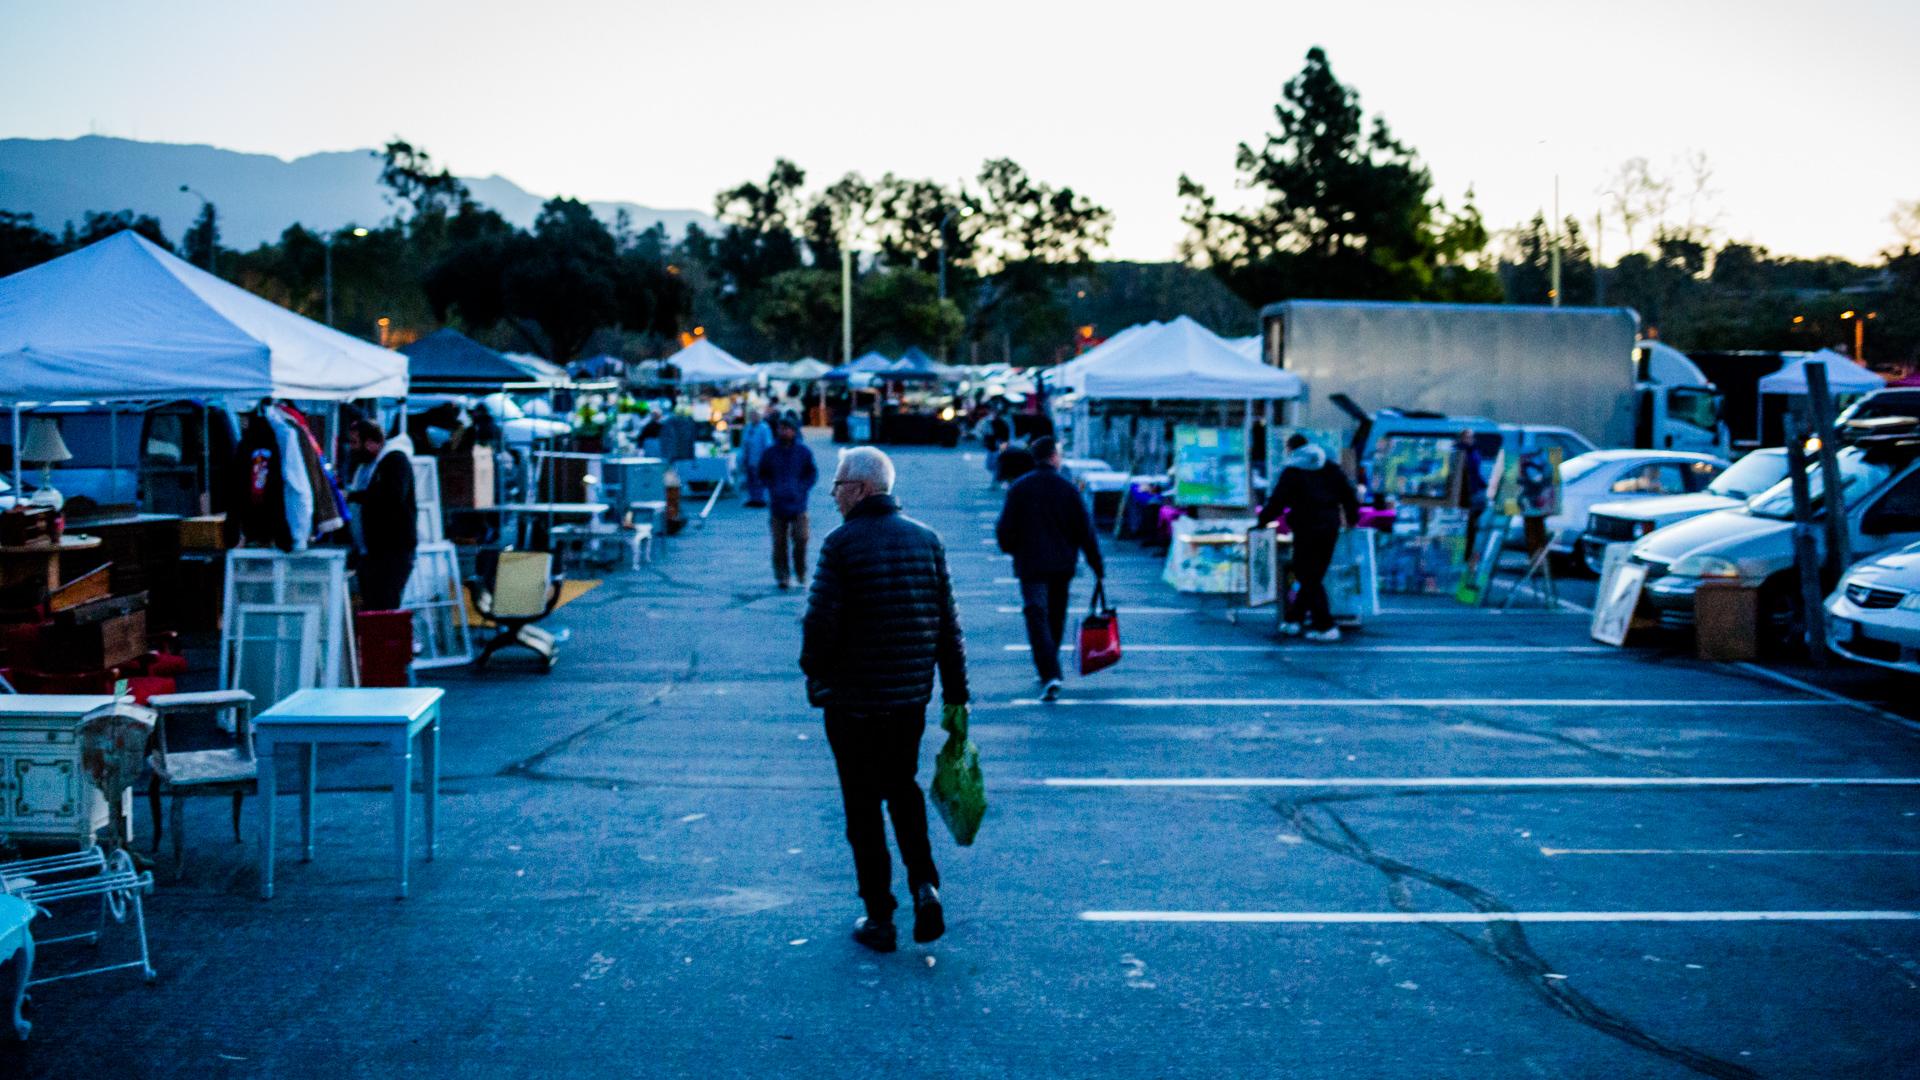 Jim_heimann_Pasadena_flea_market.jpg